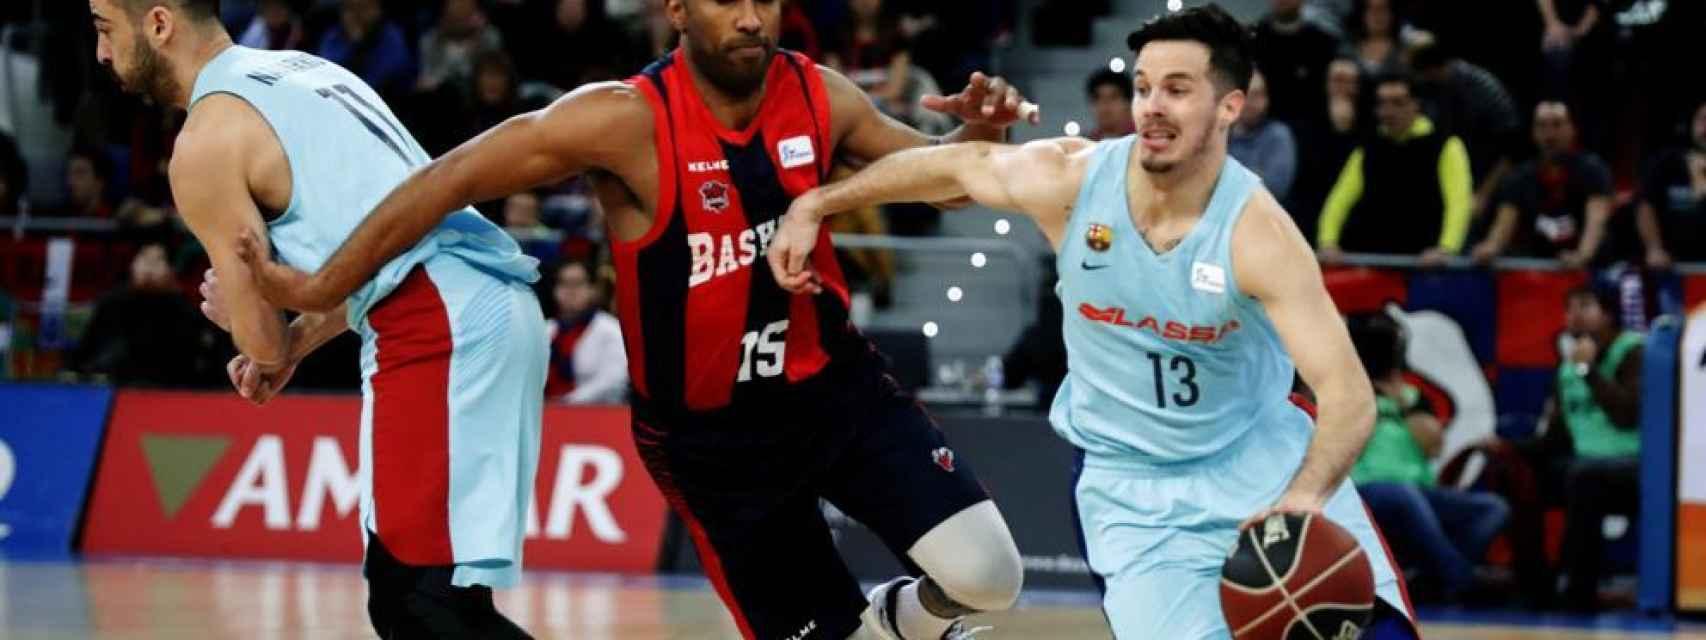 Imagen del Baskonia - Barcelona de Liga ACB.